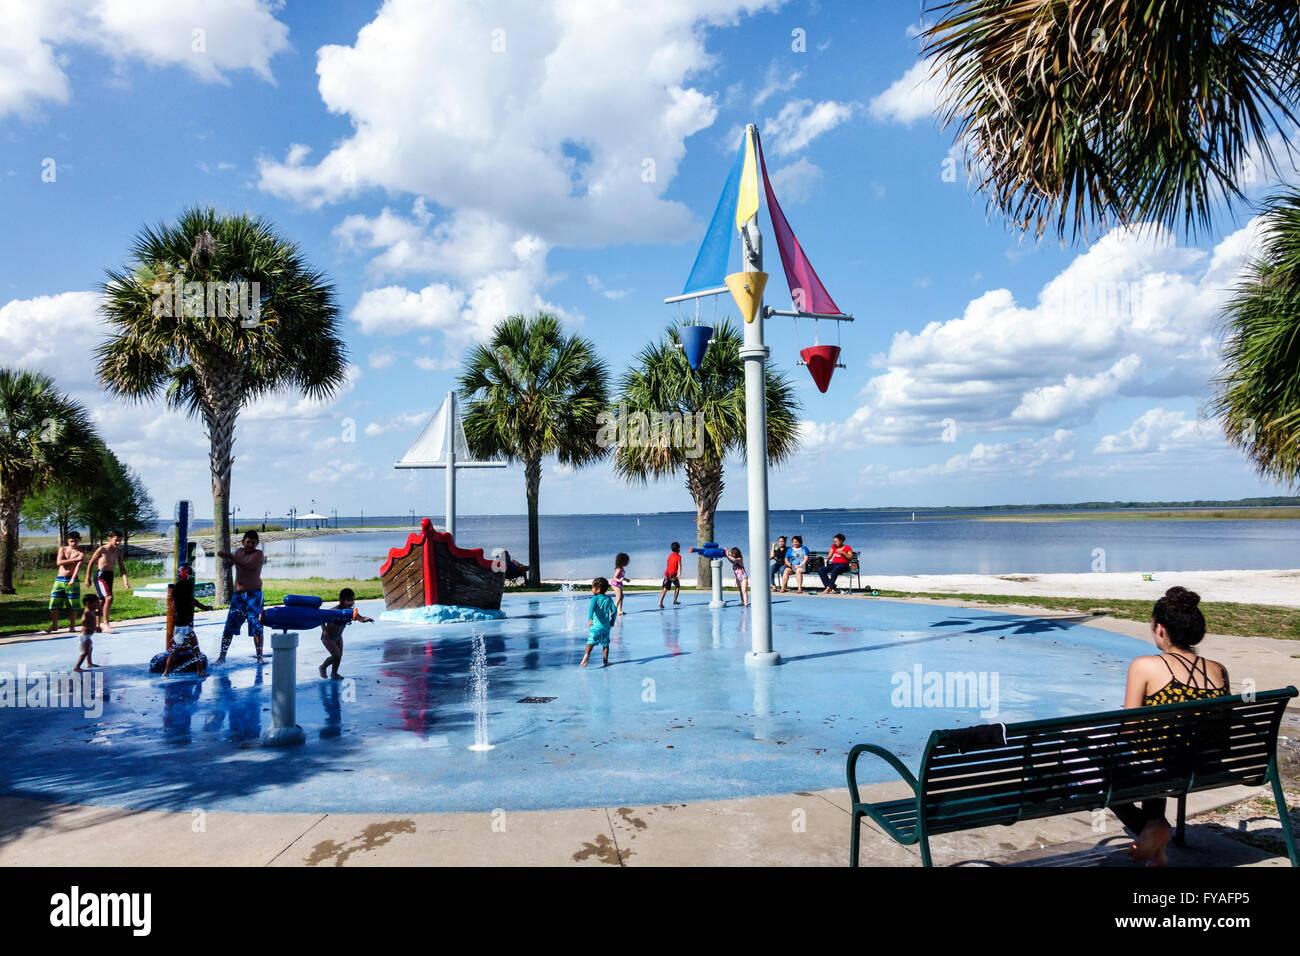 Florida St Saint Cloud Lakefront Park East Lago Tohopekaliga fuente pública splash spray almohadilla piscina Imagen De Stock